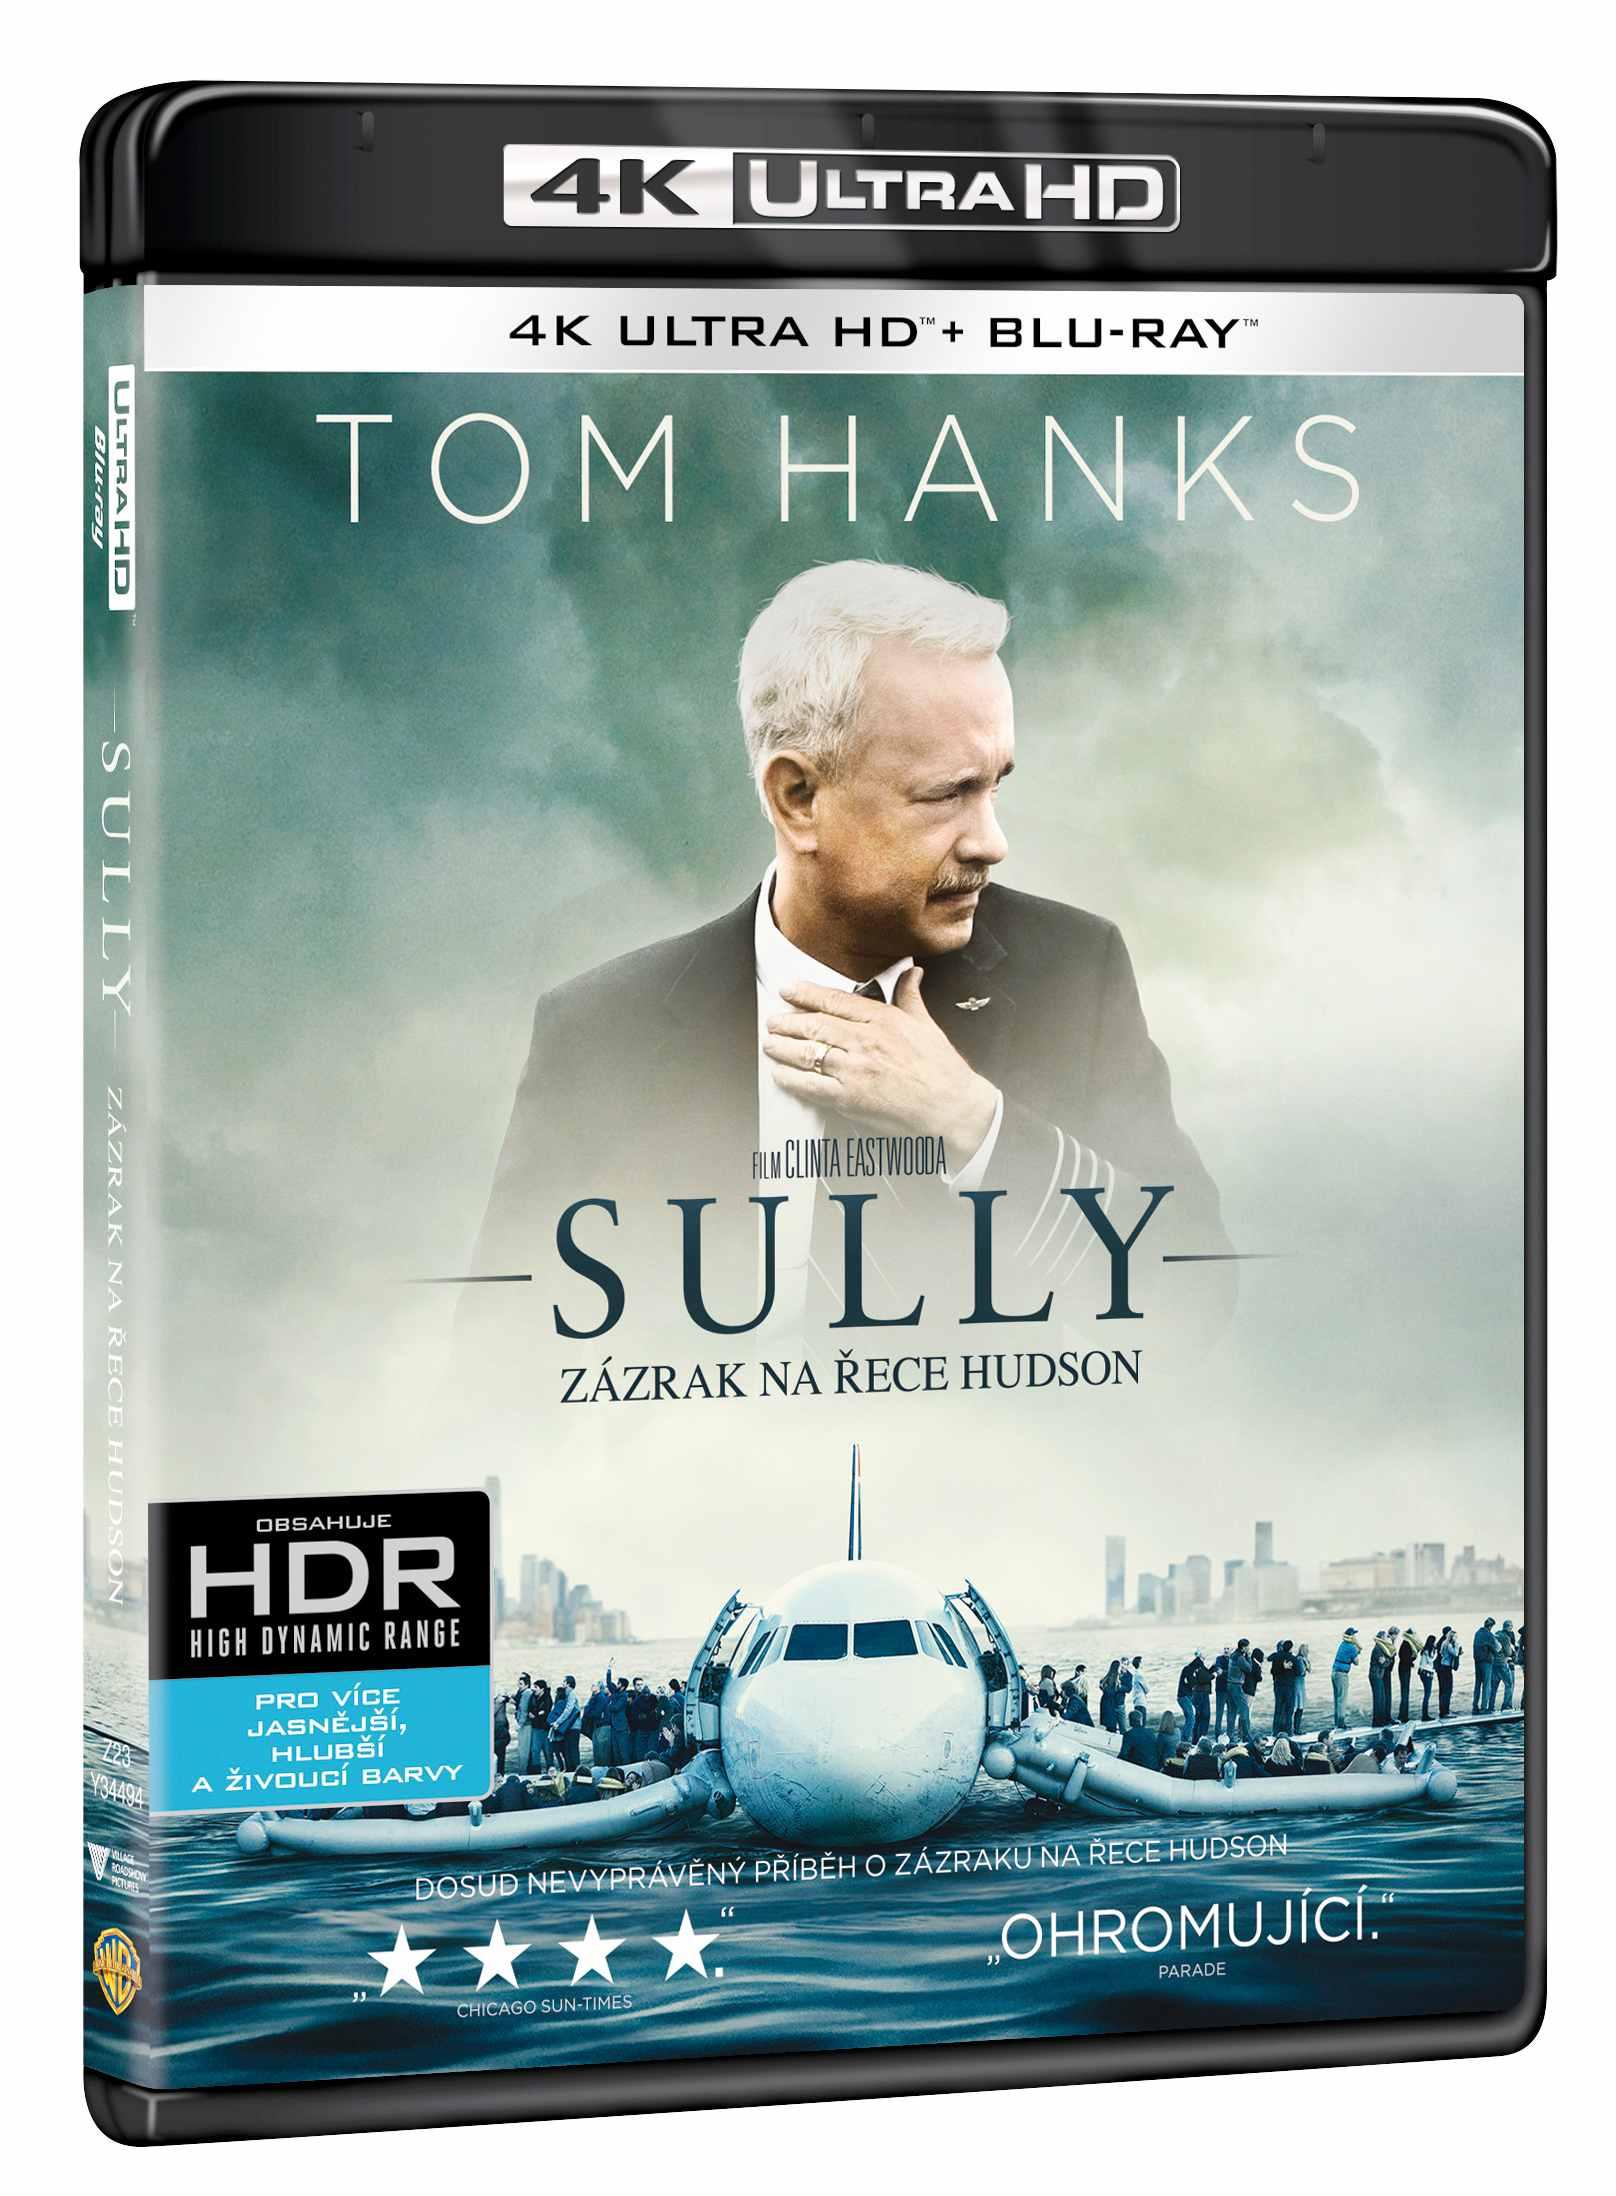 SULLY: ZÁZRAK NA ŘECE HUDSON (4K ULTRA HD) - UHD Blu-ray + Blu-ray (2 BD)